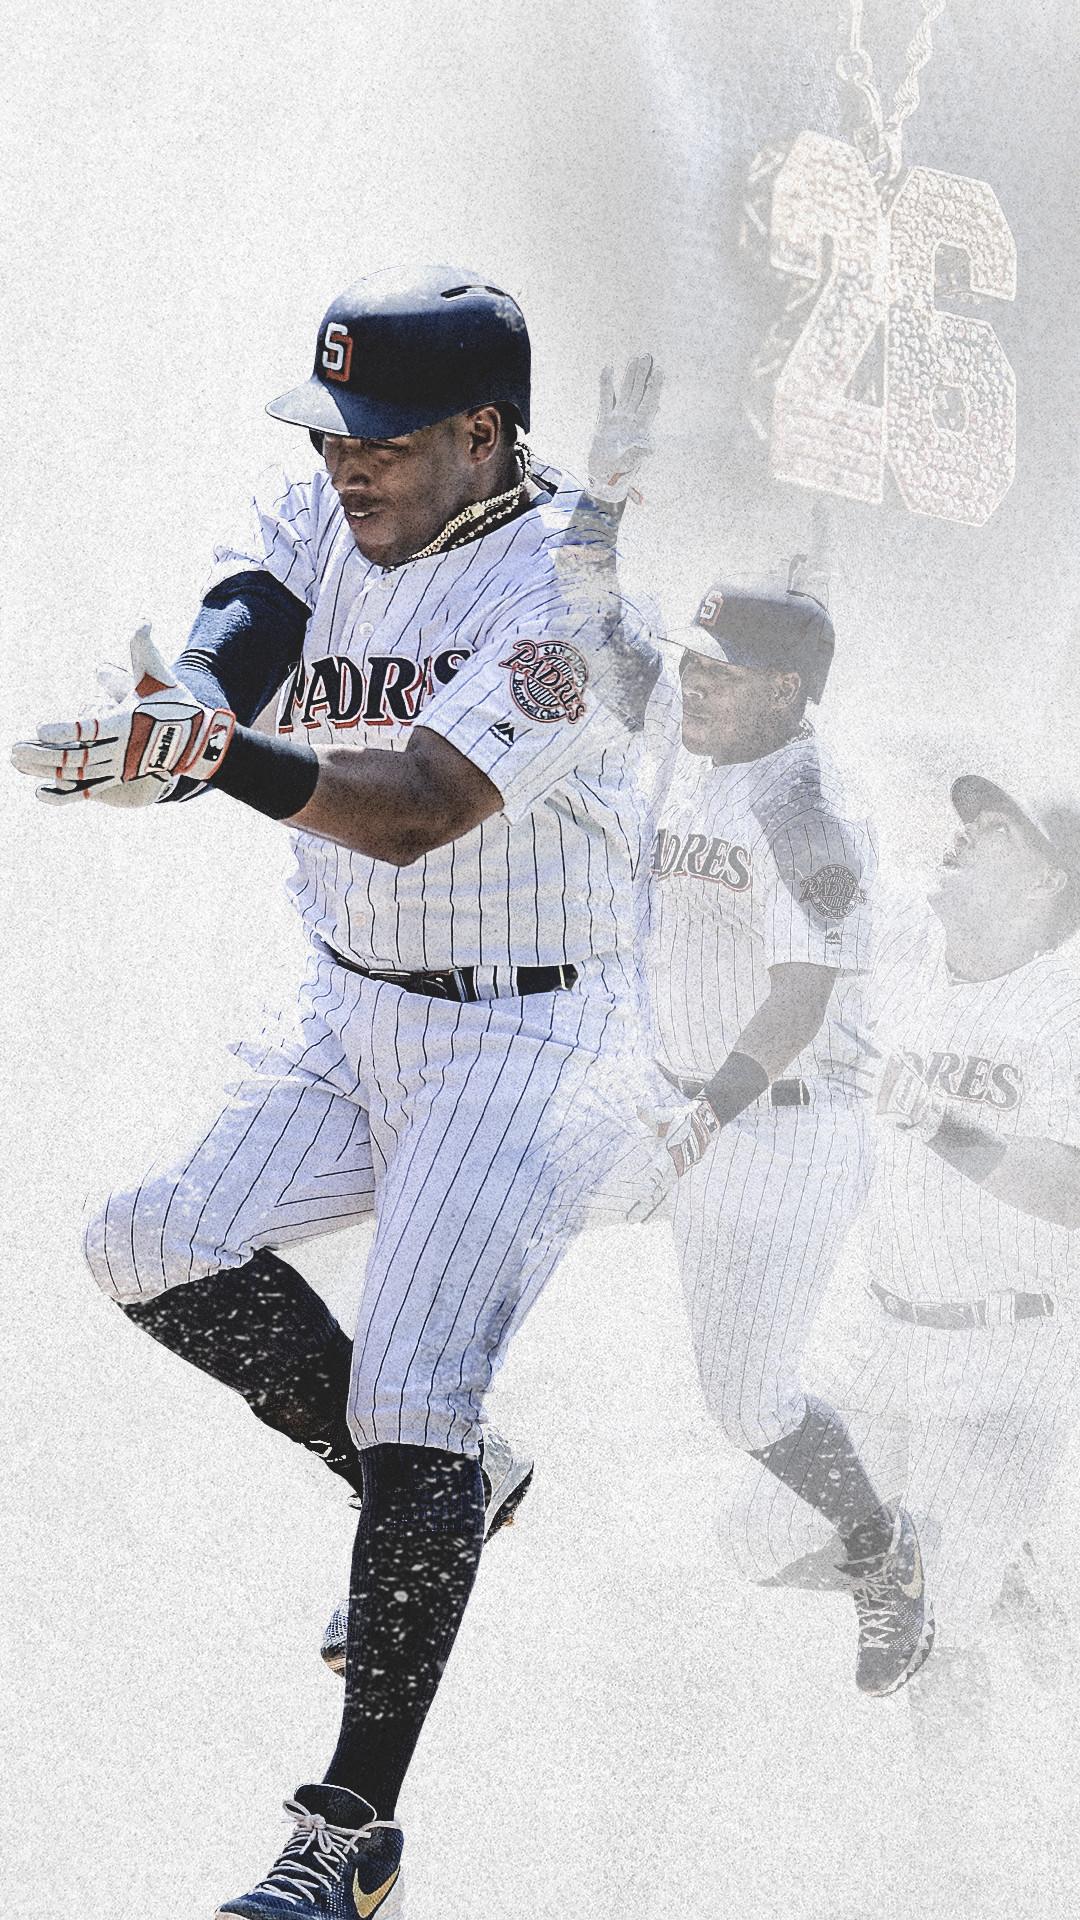 San Diego Padres Wallpapers Wallpapertag